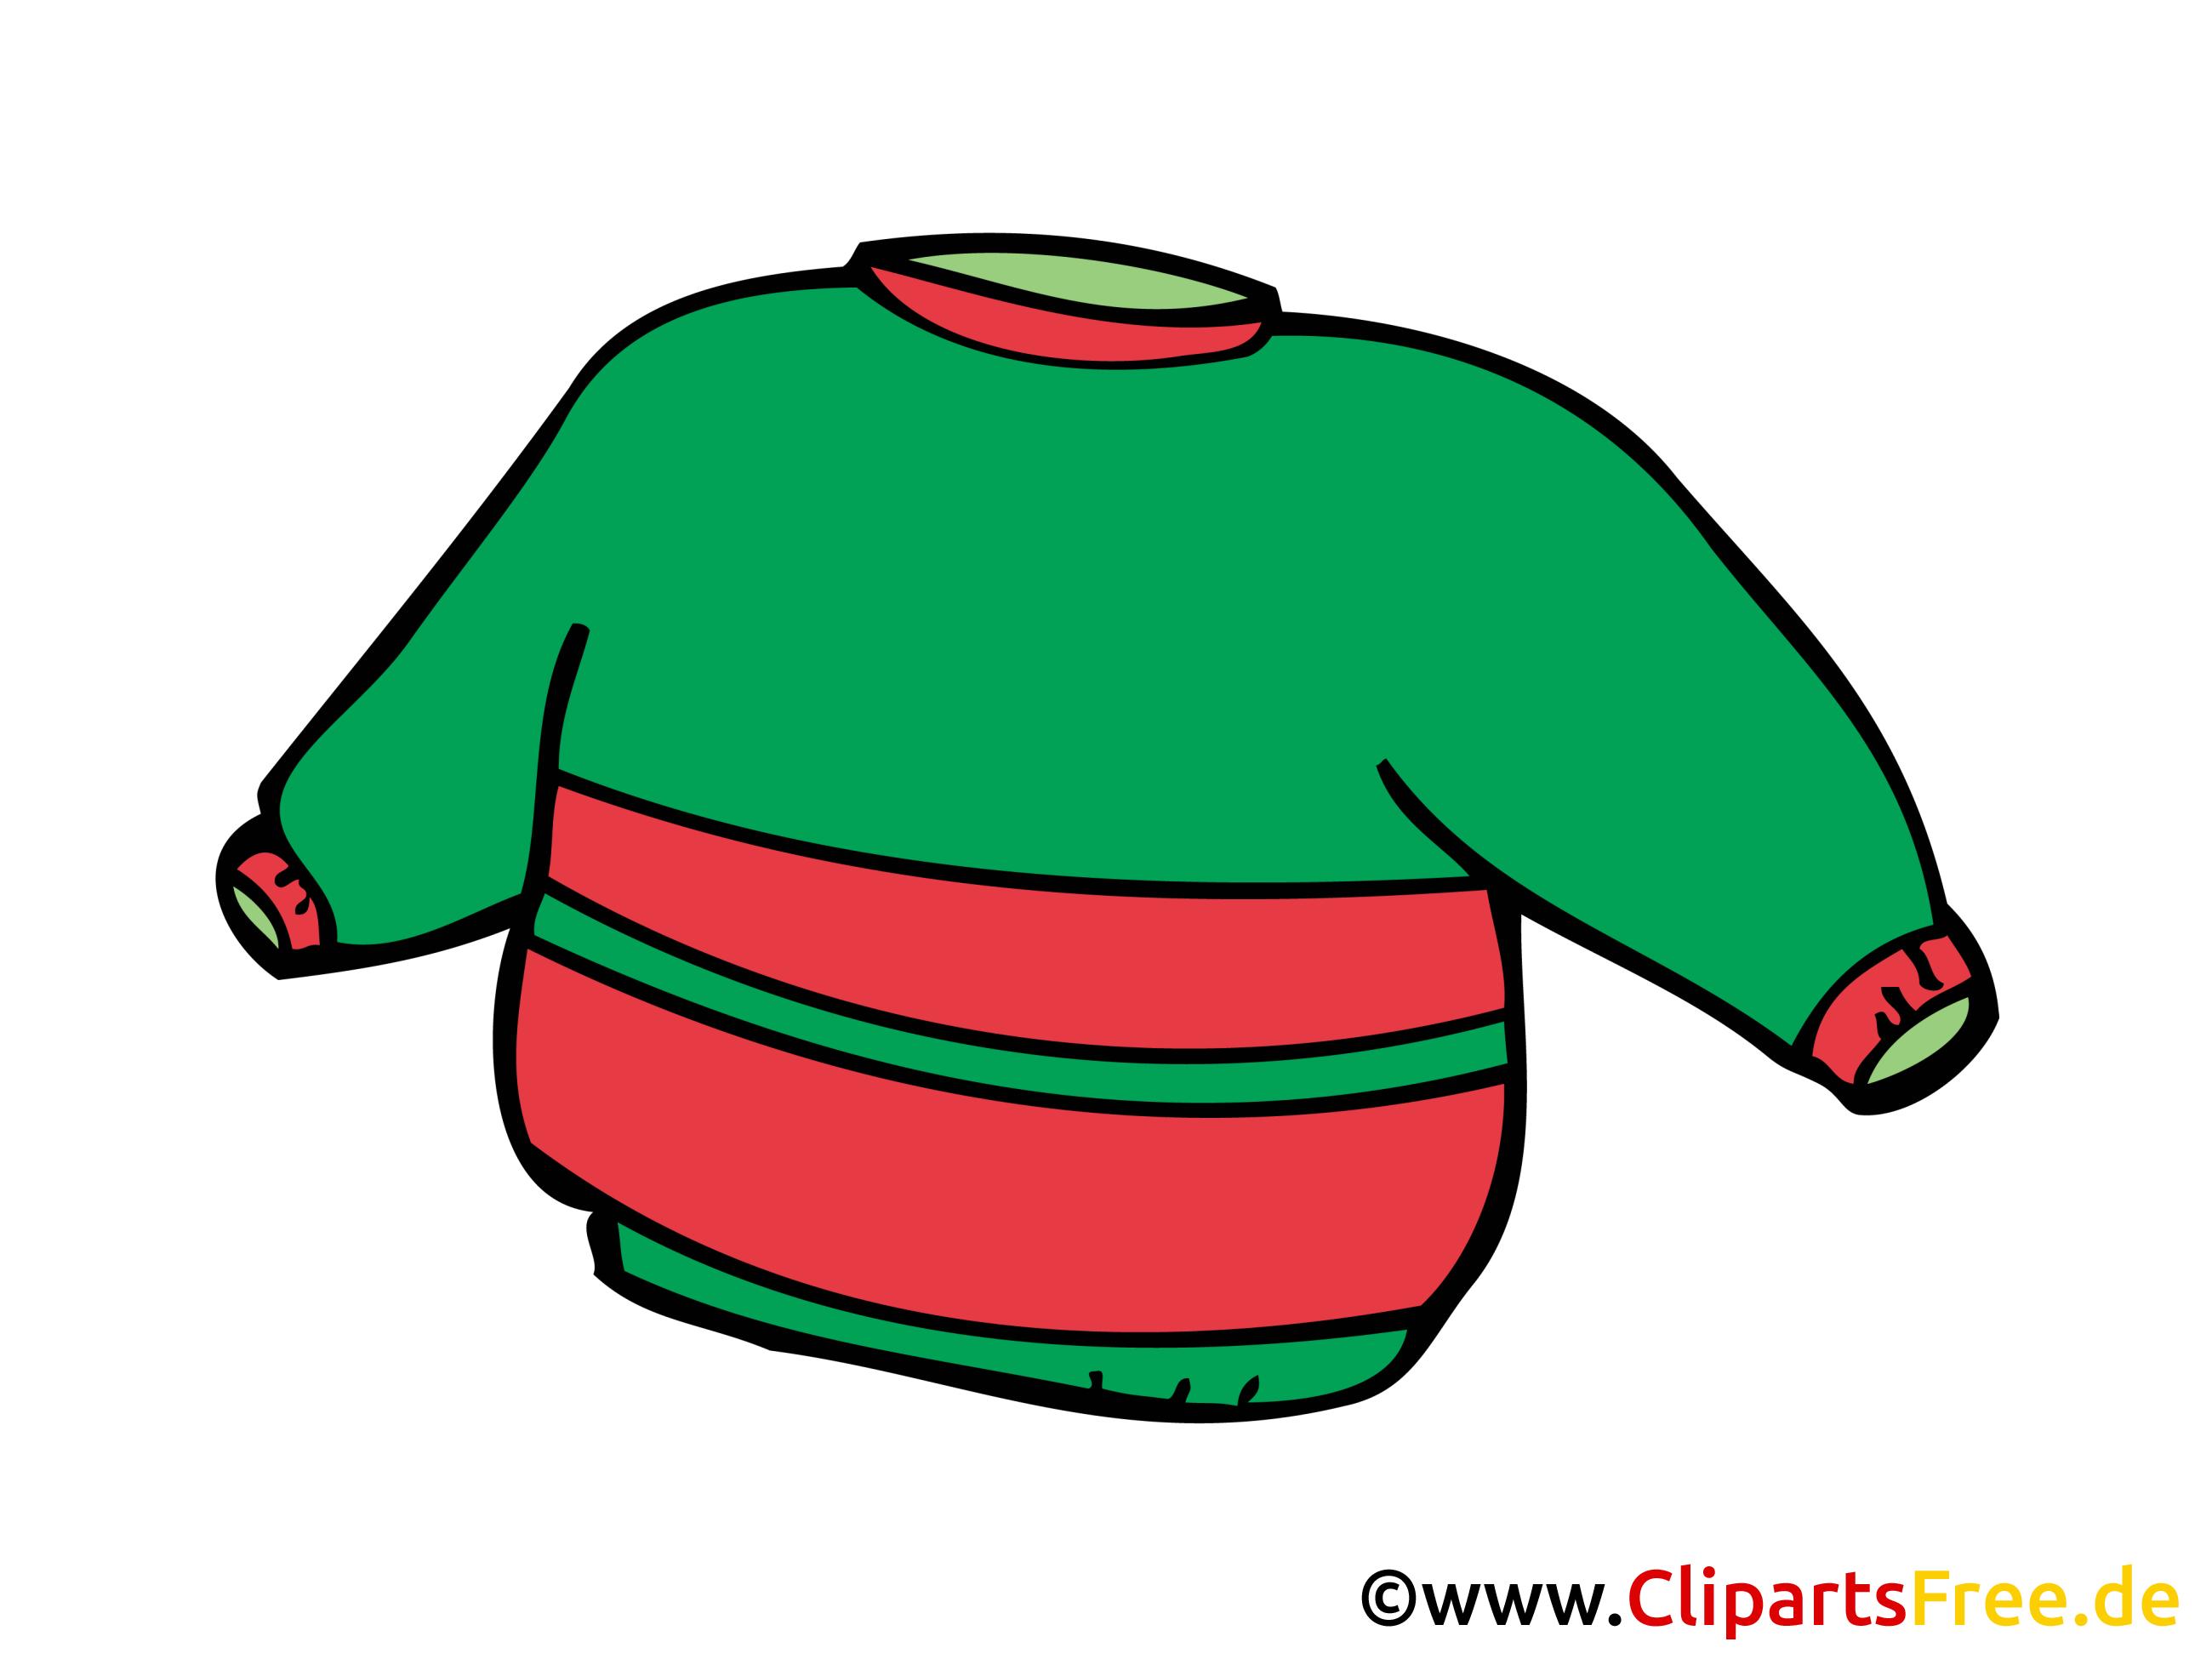 Sweater dessins gratuits clipart